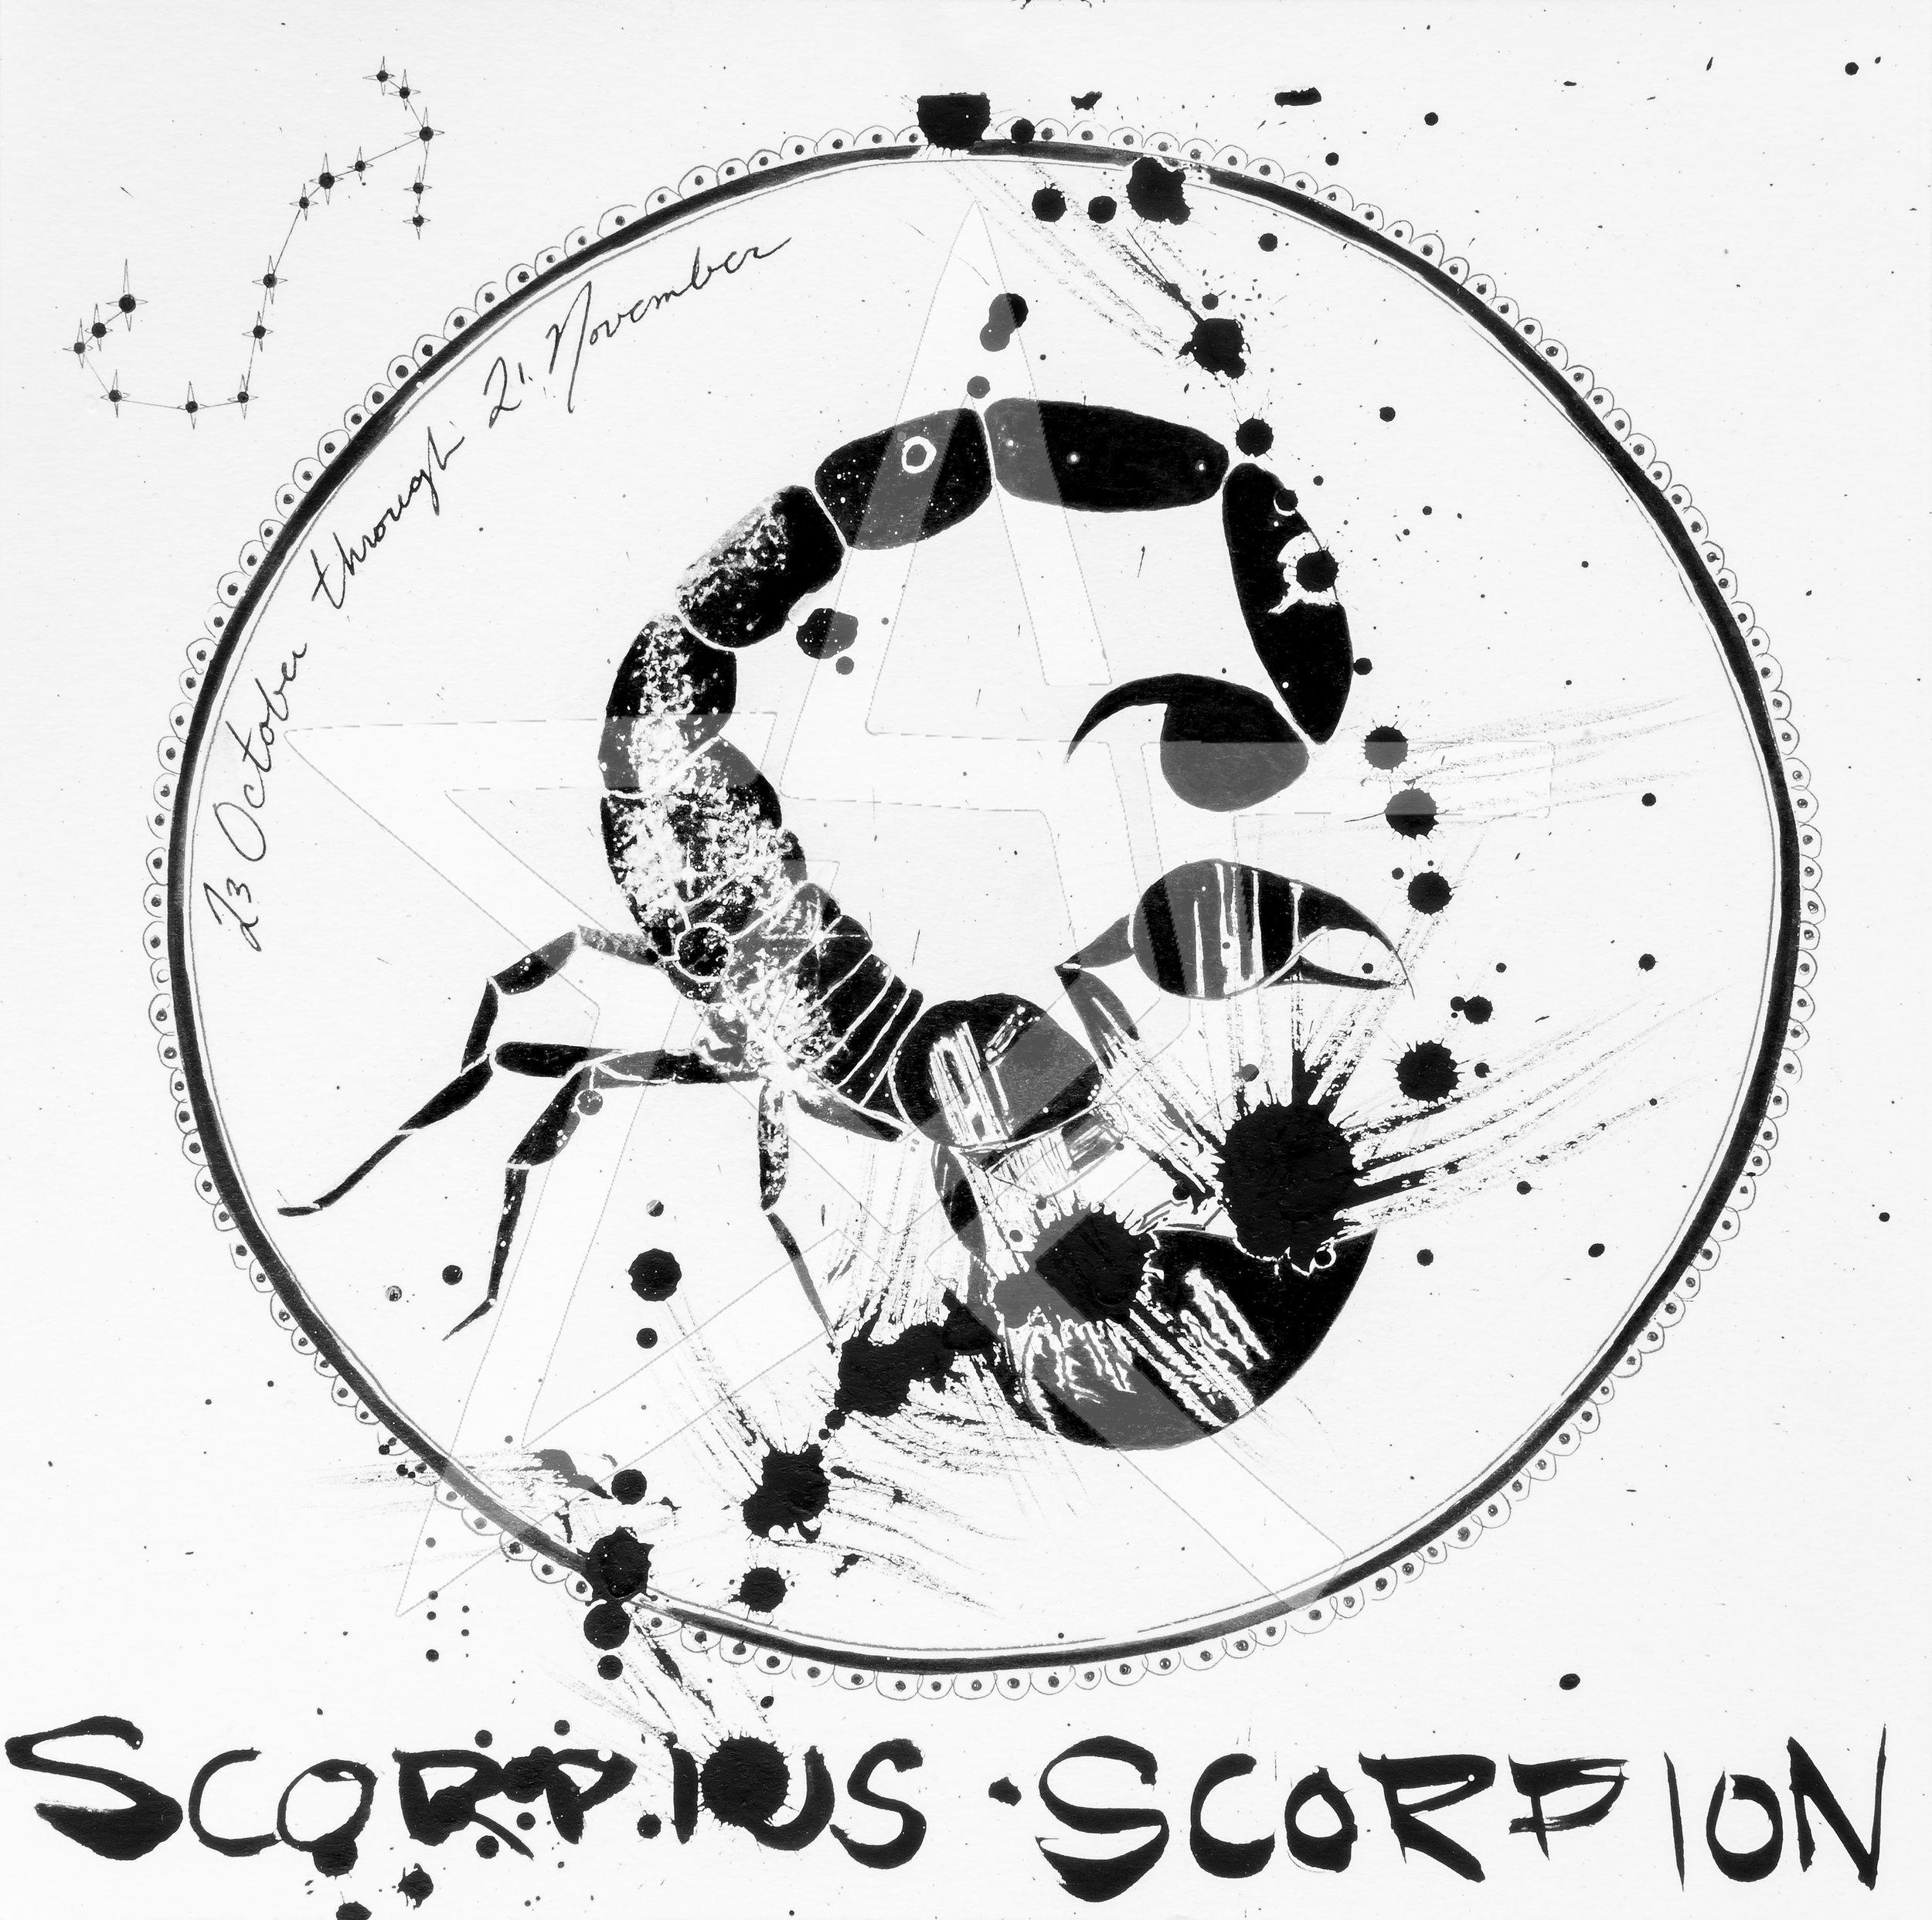 Scorpius ink watermark.jpg